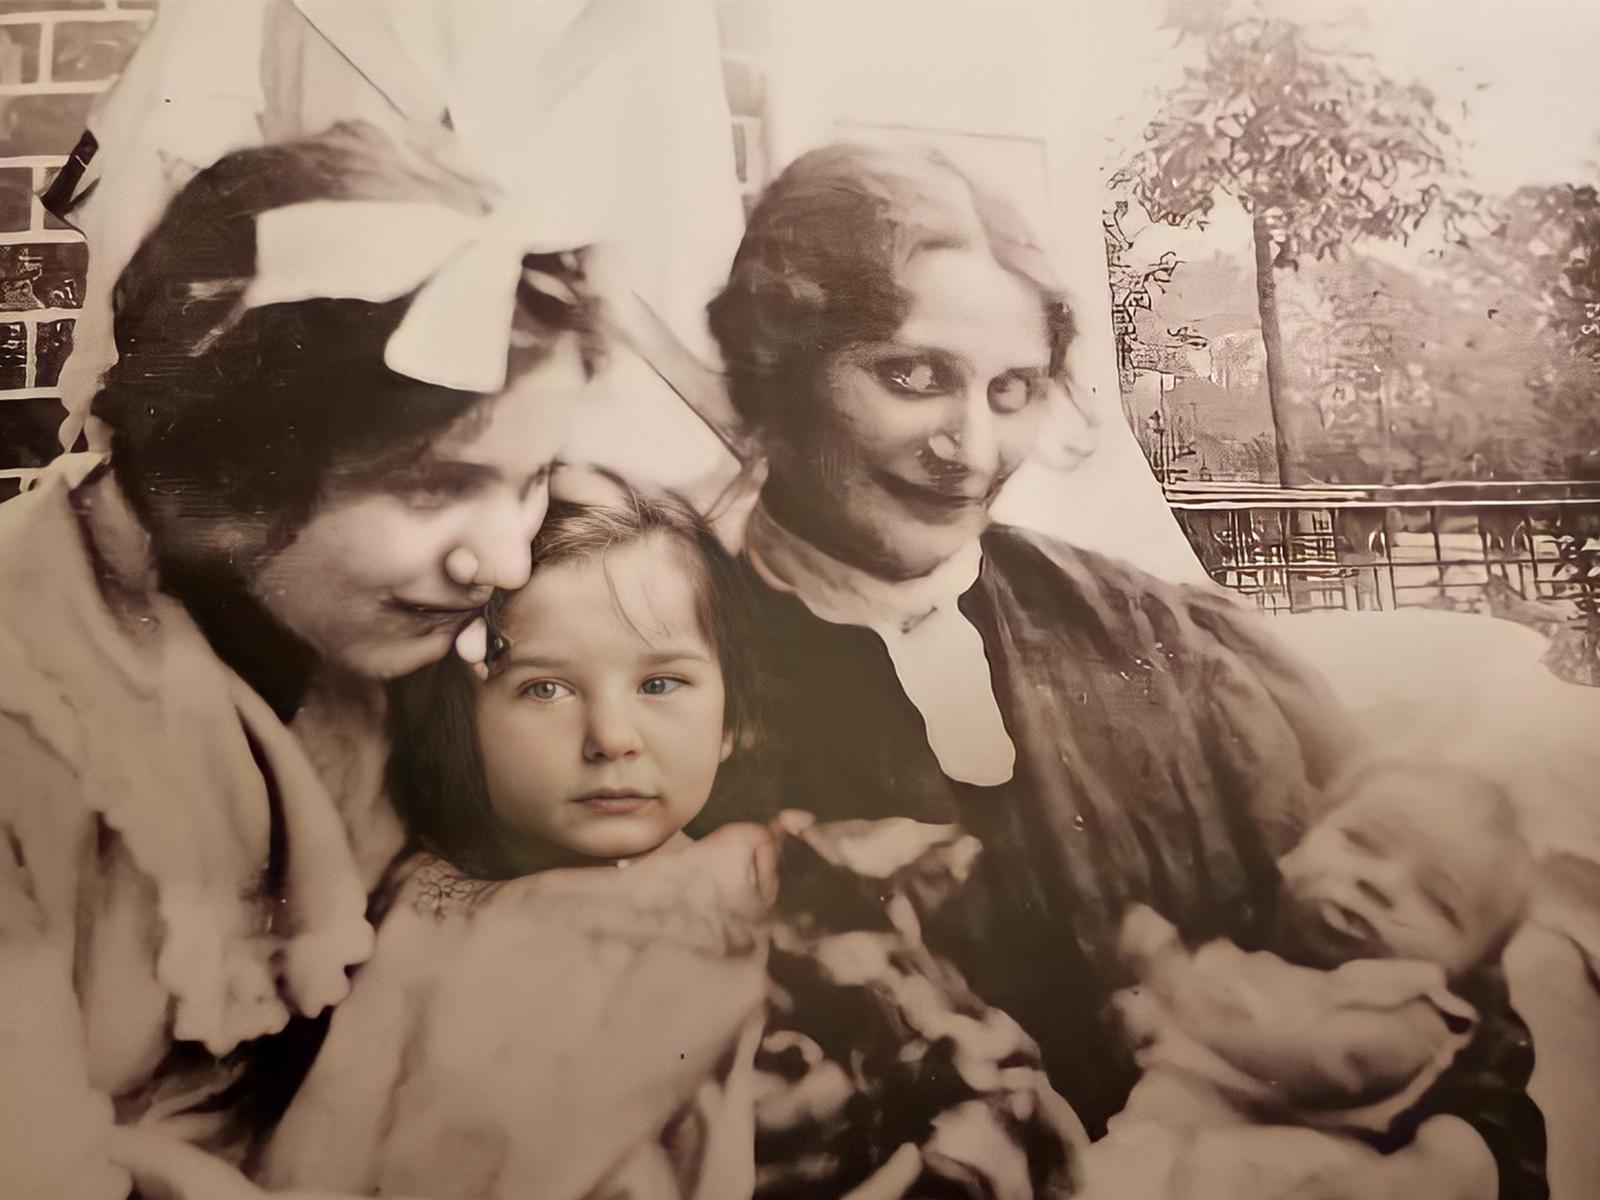 Início da juventude de Edith Stein e suas crises